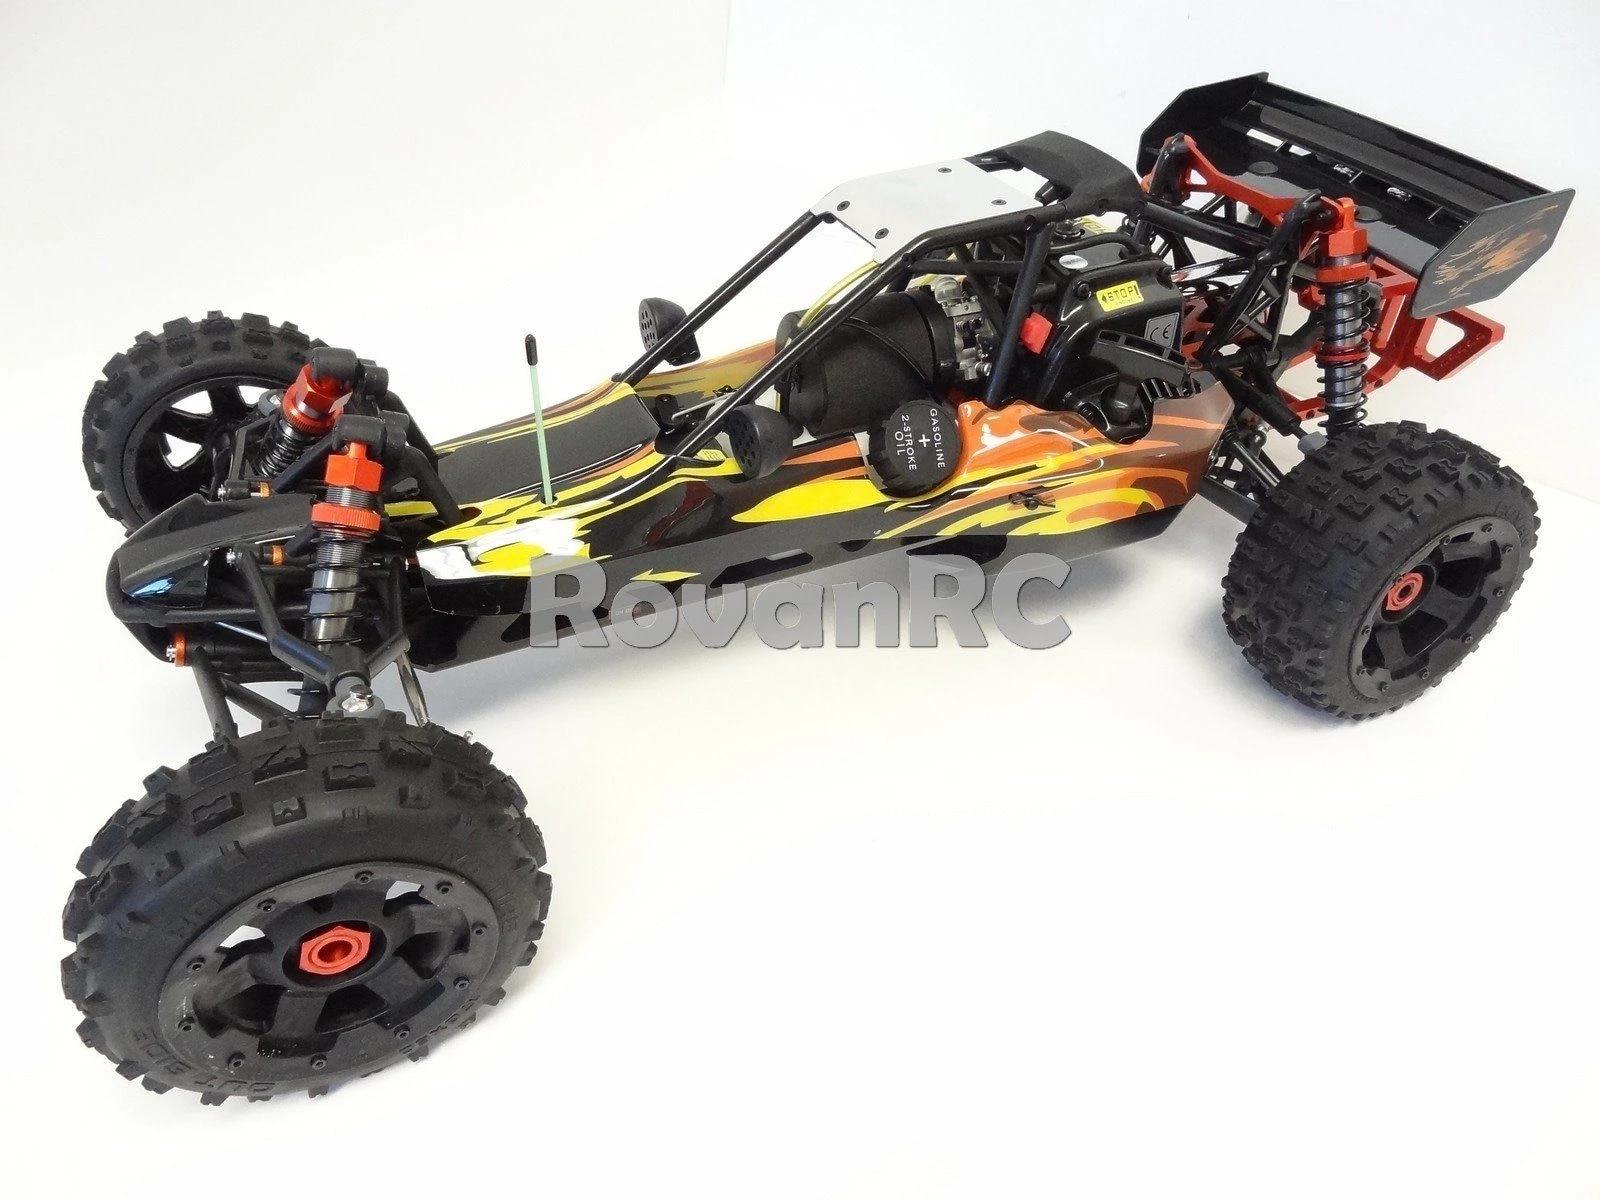 Rovan Rc 1 5 Schaal Rtr 305c Gas Baja Buggy 30 5cc Hpi Baja 5b Ss Koning Compatibel Hpi Baja 5b Baja 5bhpi Baja Aliexpress